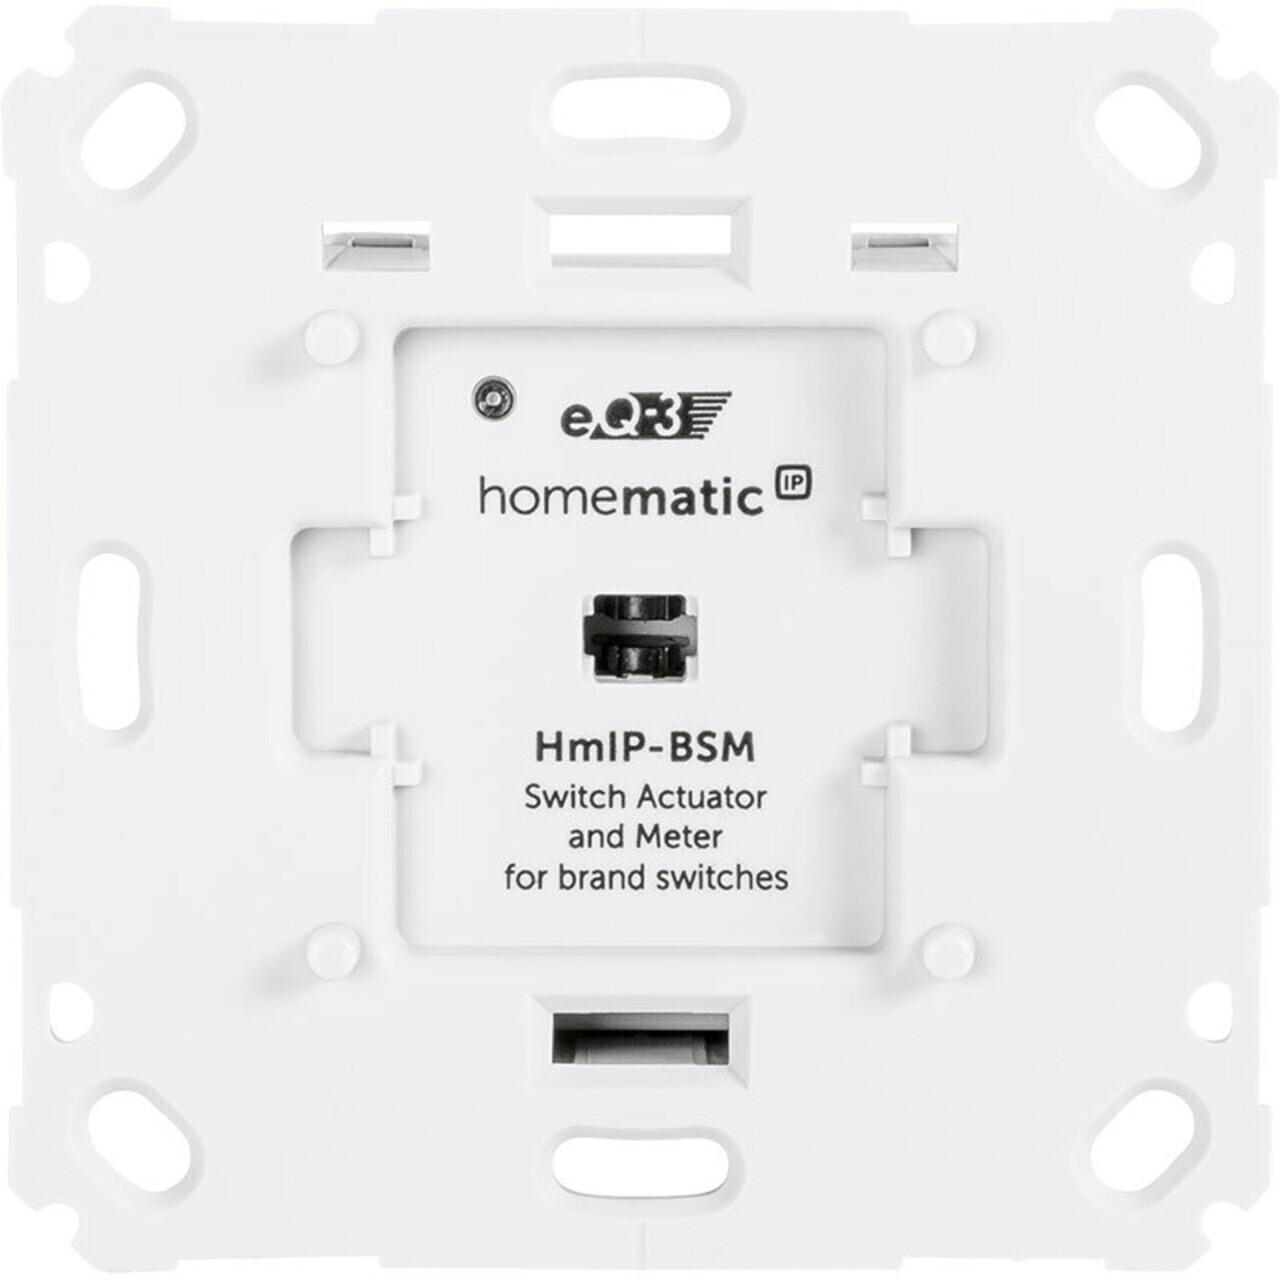 Homematic IP Schalt-Mess-Aktor für Markenschalter (HmIP-BSM)